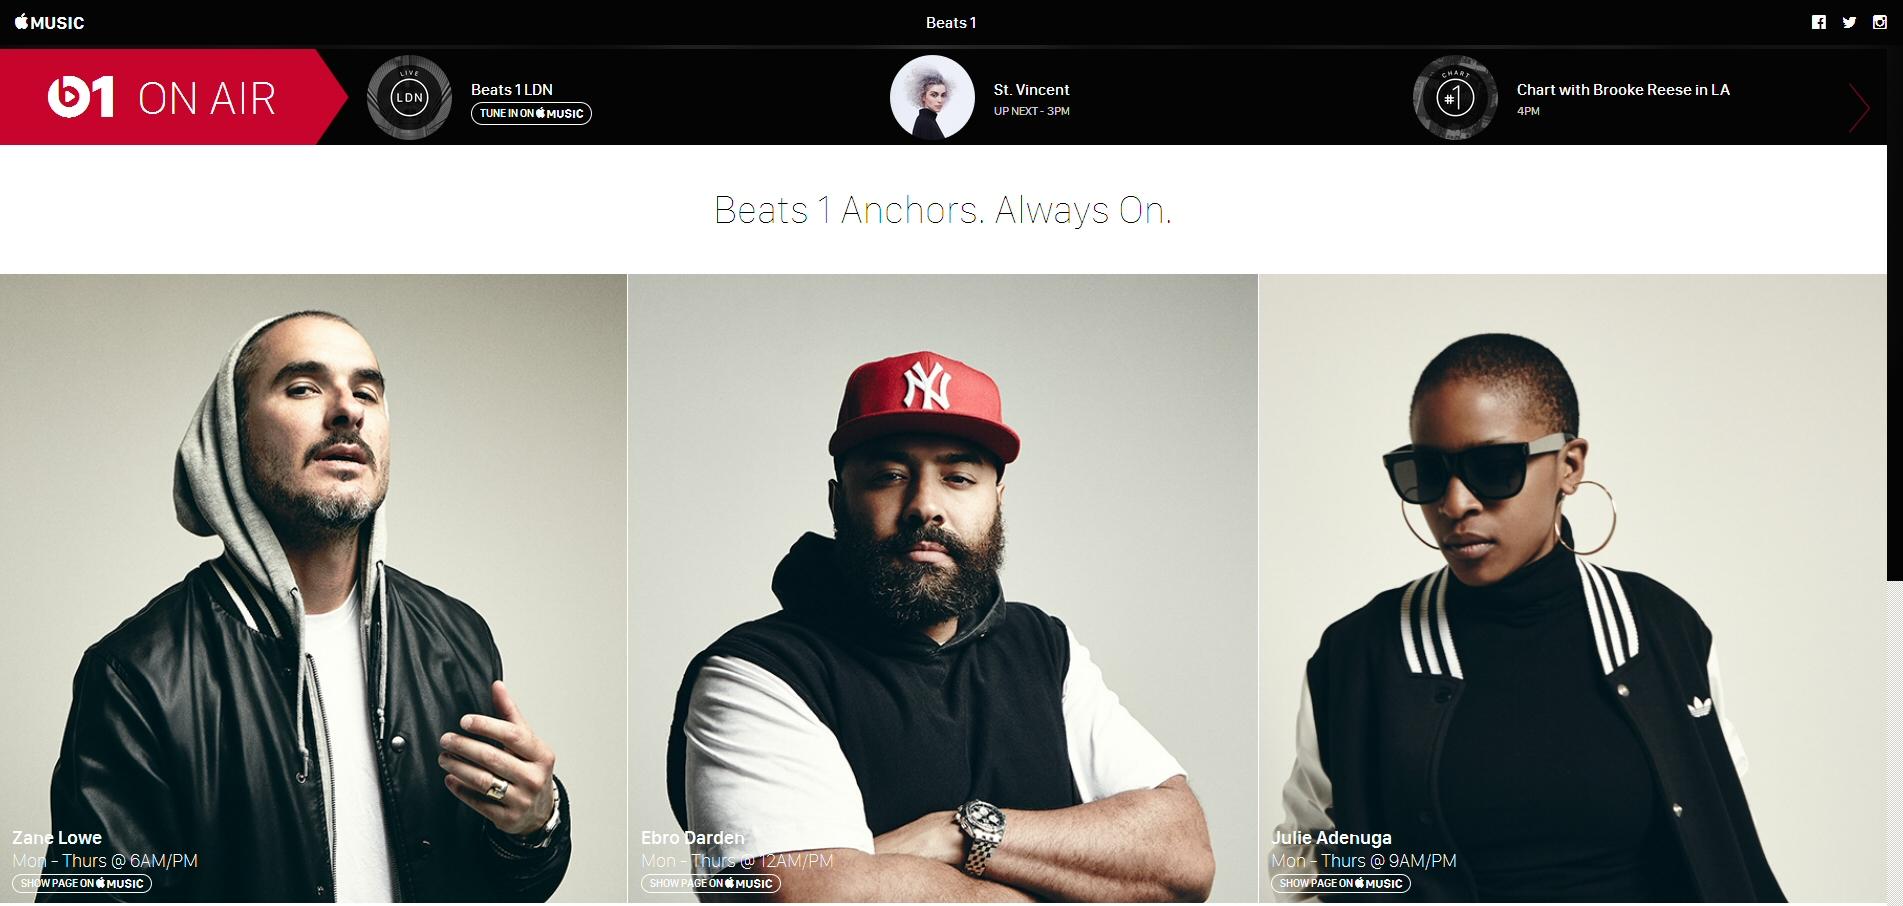 apple_music_beats1_1.jpg